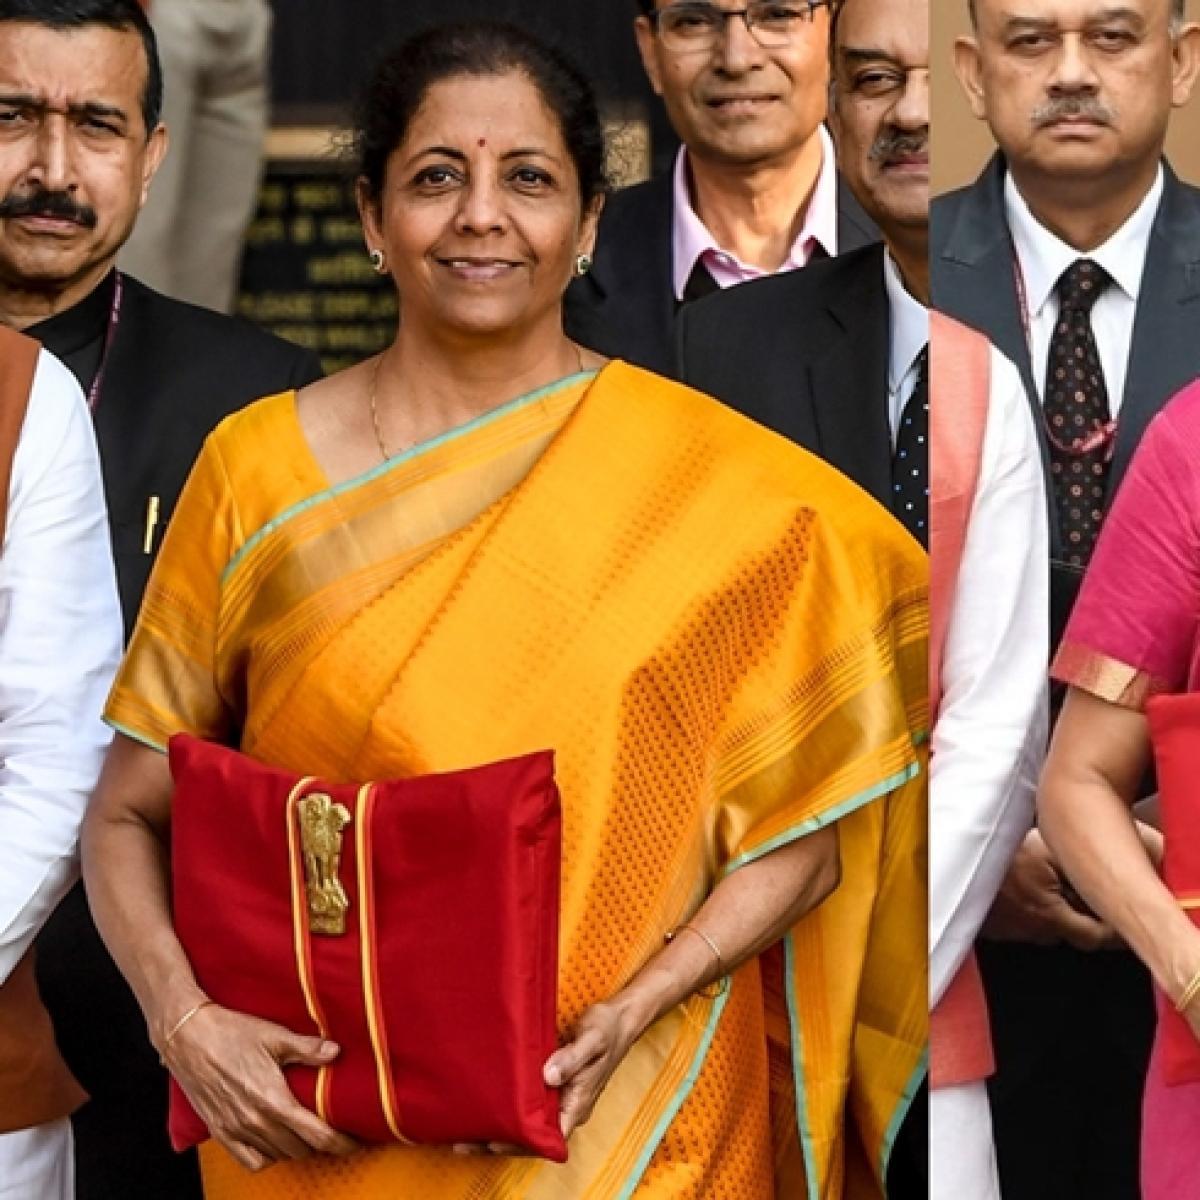 Budget 2020: FM Nirmala Sitharaman back with traditional 'bahi khata' but with a design change